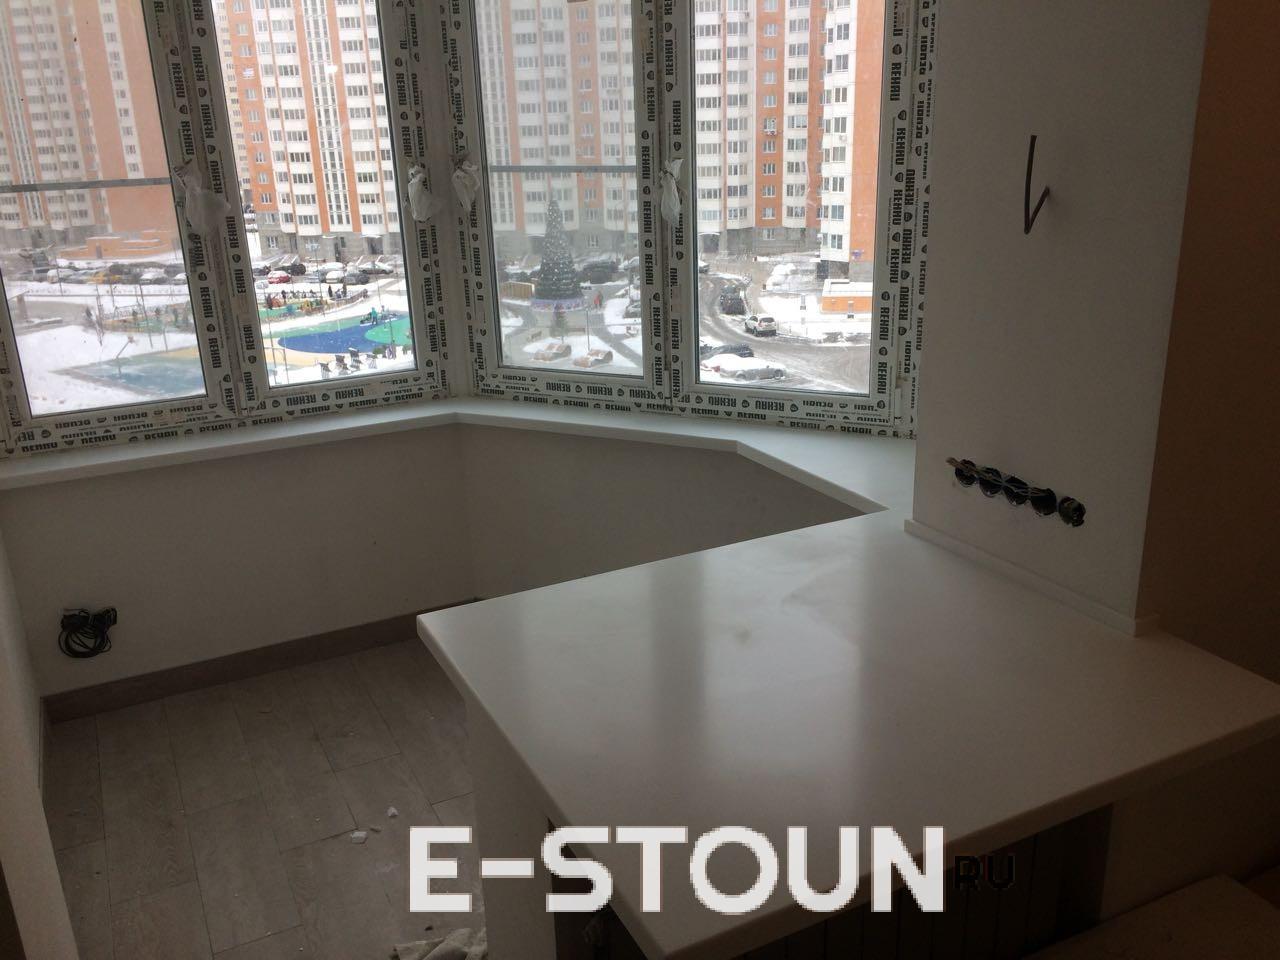 Подоконник из камня на балкон: цена и фотографии. Производитель компания e-stoun.ru